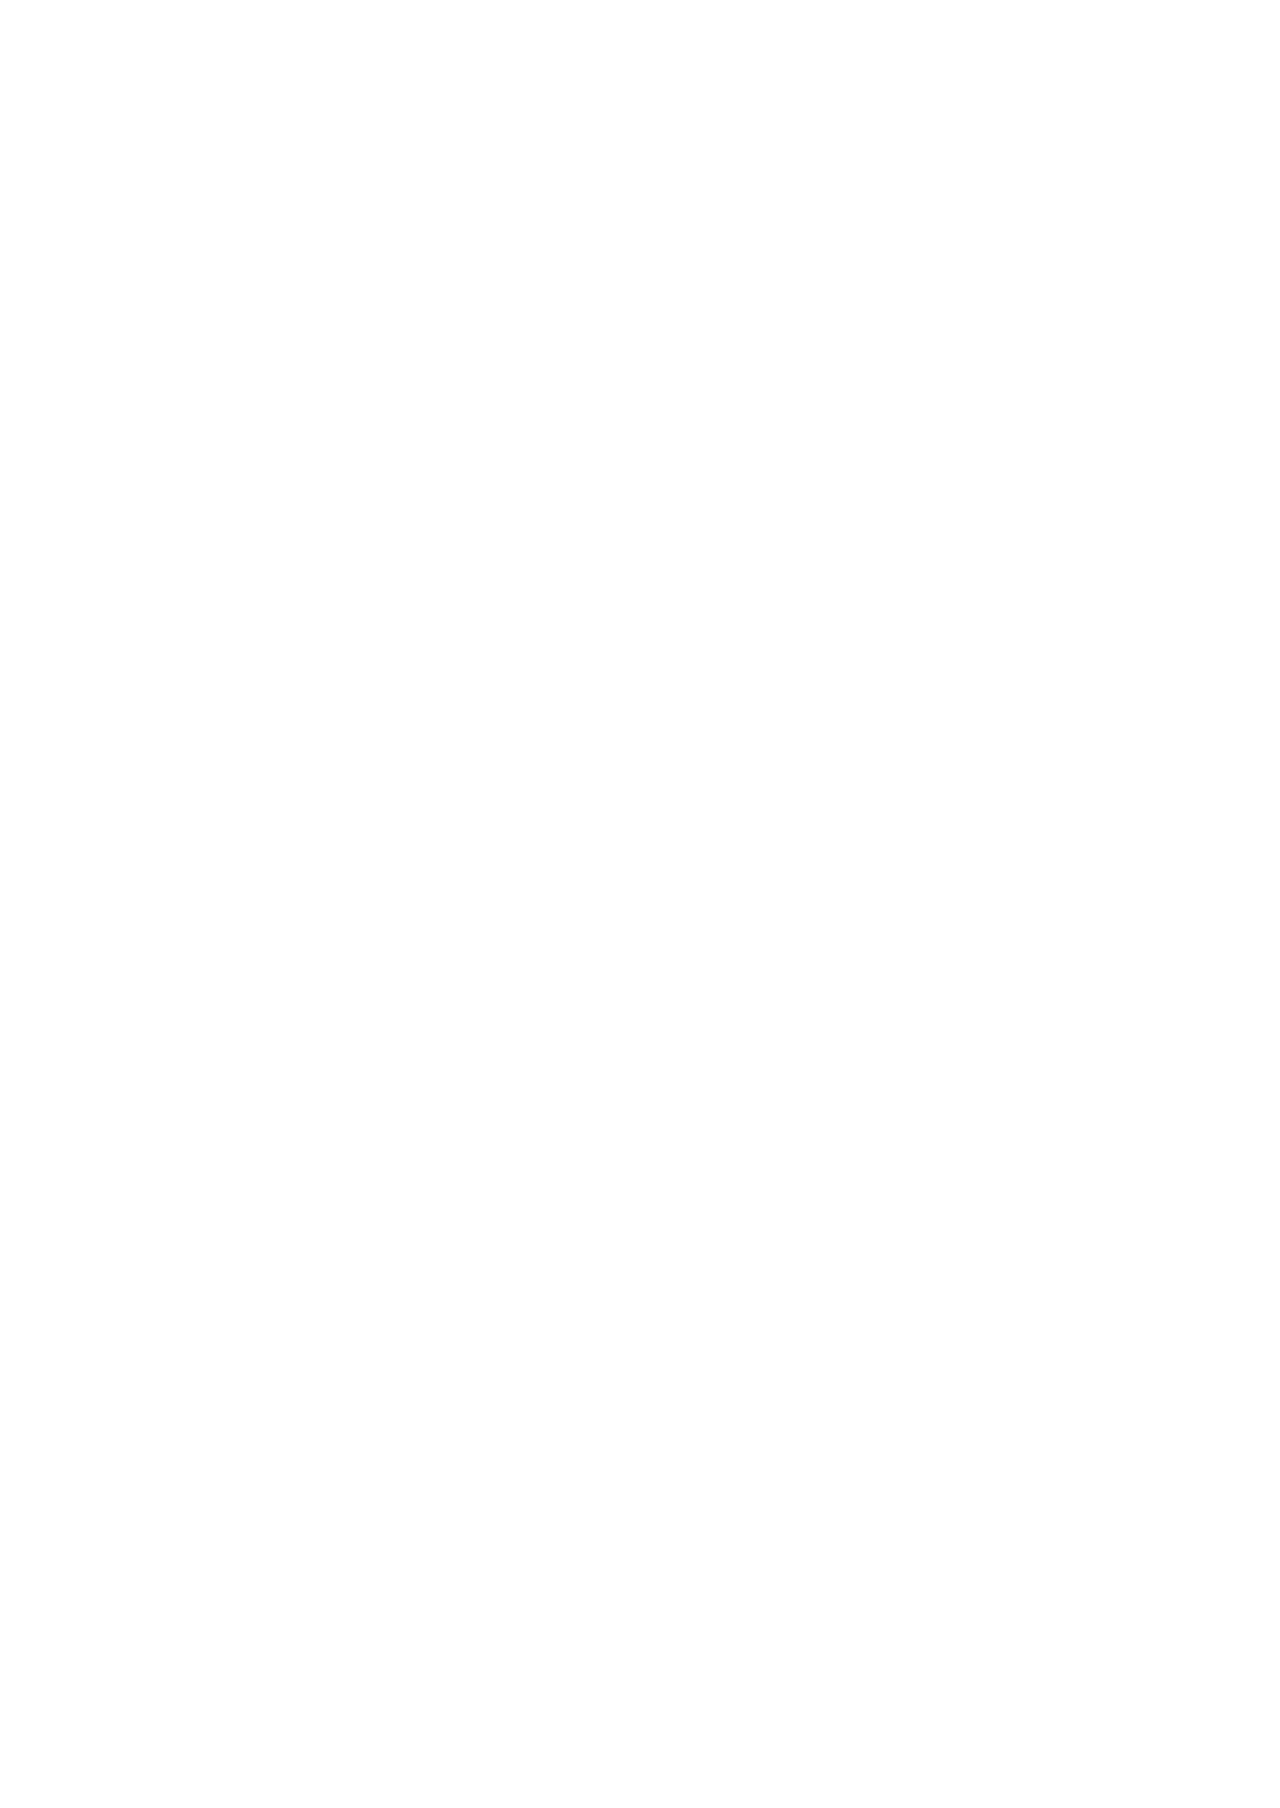 [Akuten Soushin (Kokutou Nikke)] Kanmusu Chakunin Zenya - Atlanta Mune-Sei Houshi Katsudou (Kantai Collection -KanColle-) [Chinese] [therethere個人翻譯&嵌字] [Digital] 2